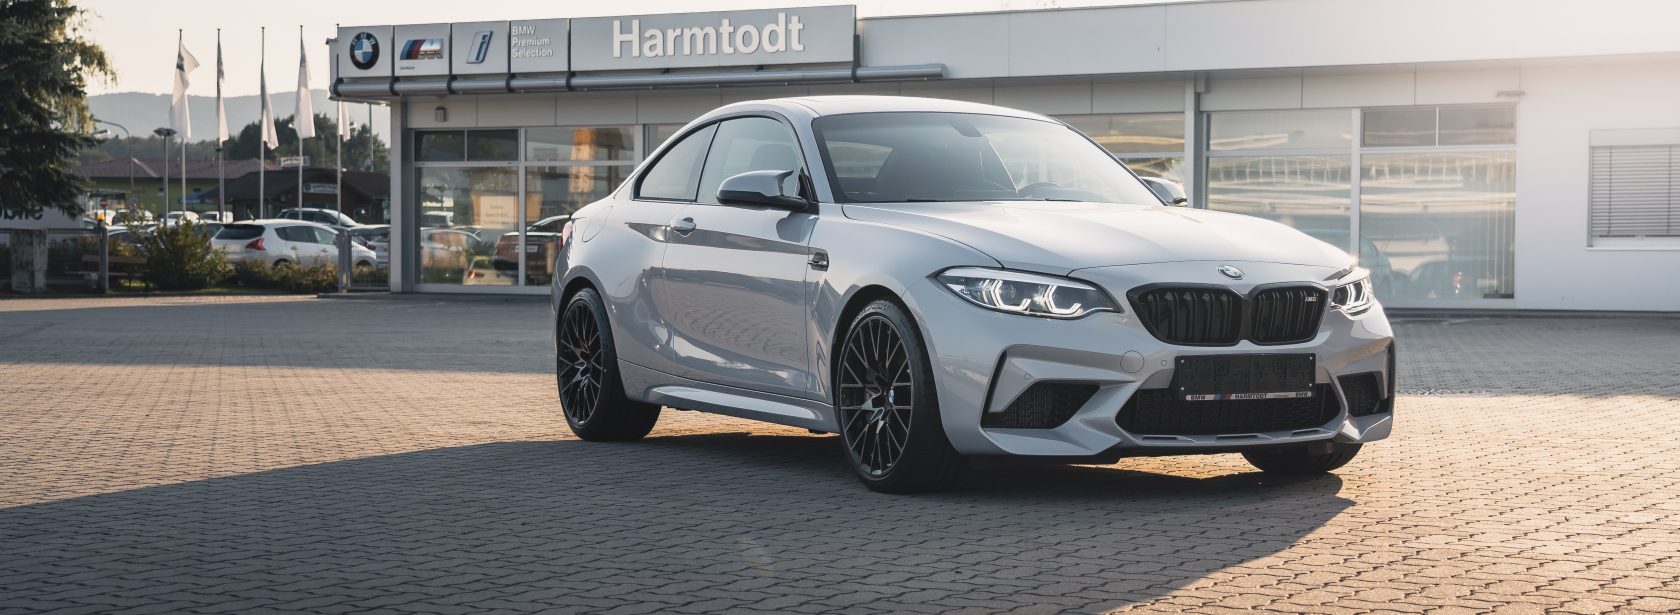 BMW Harmtodt